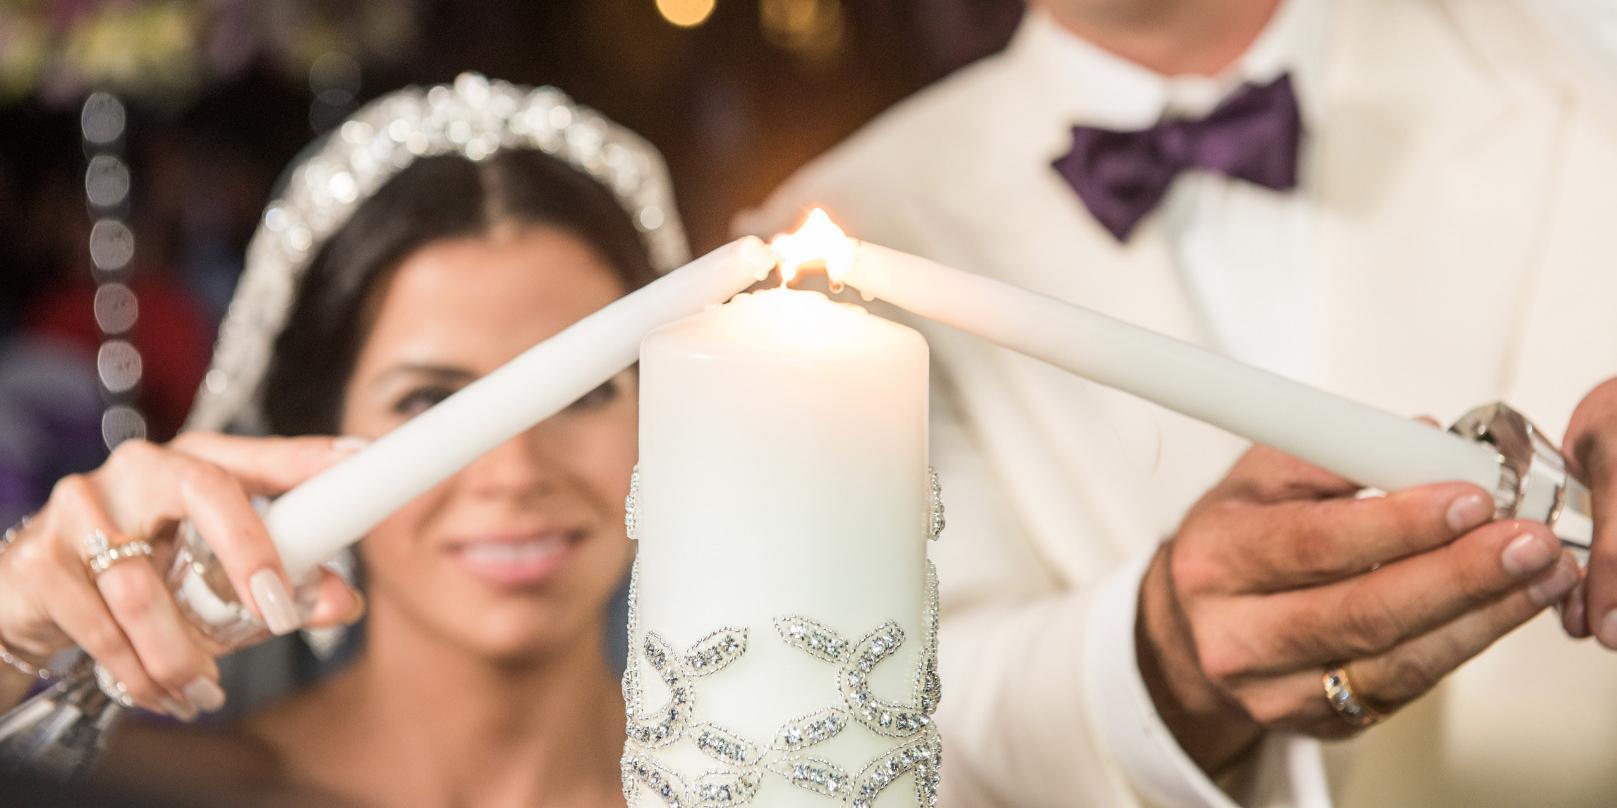 bodas-estilo-clasico-sin-tema-cuba-16581.jpg